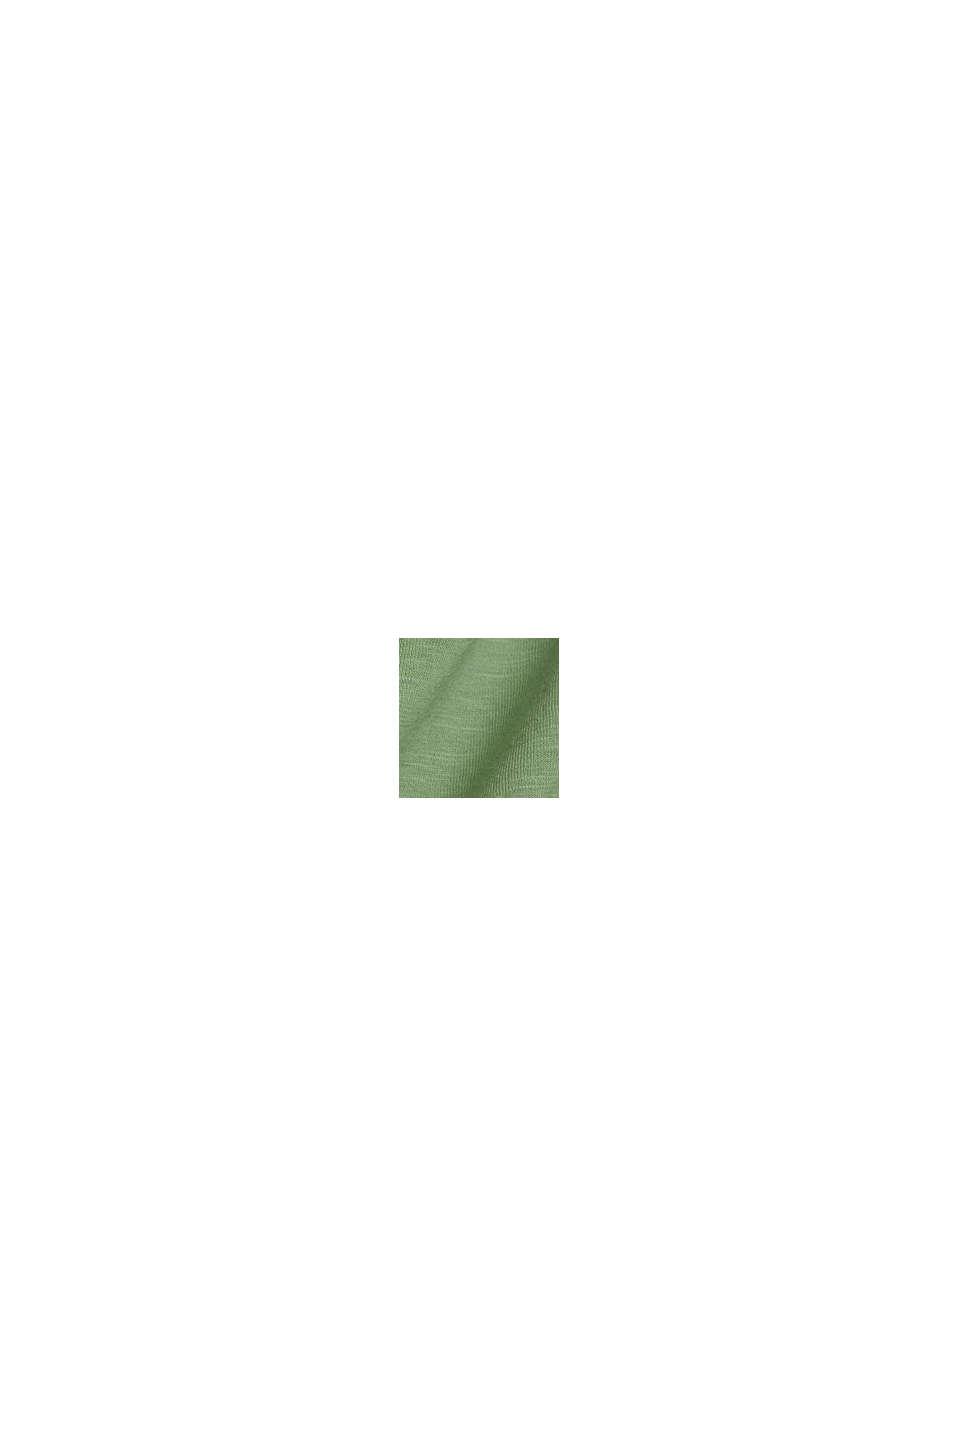 T-Shirt mit Organic Cotton/TENCEL™, LEAF GREEN, swatch